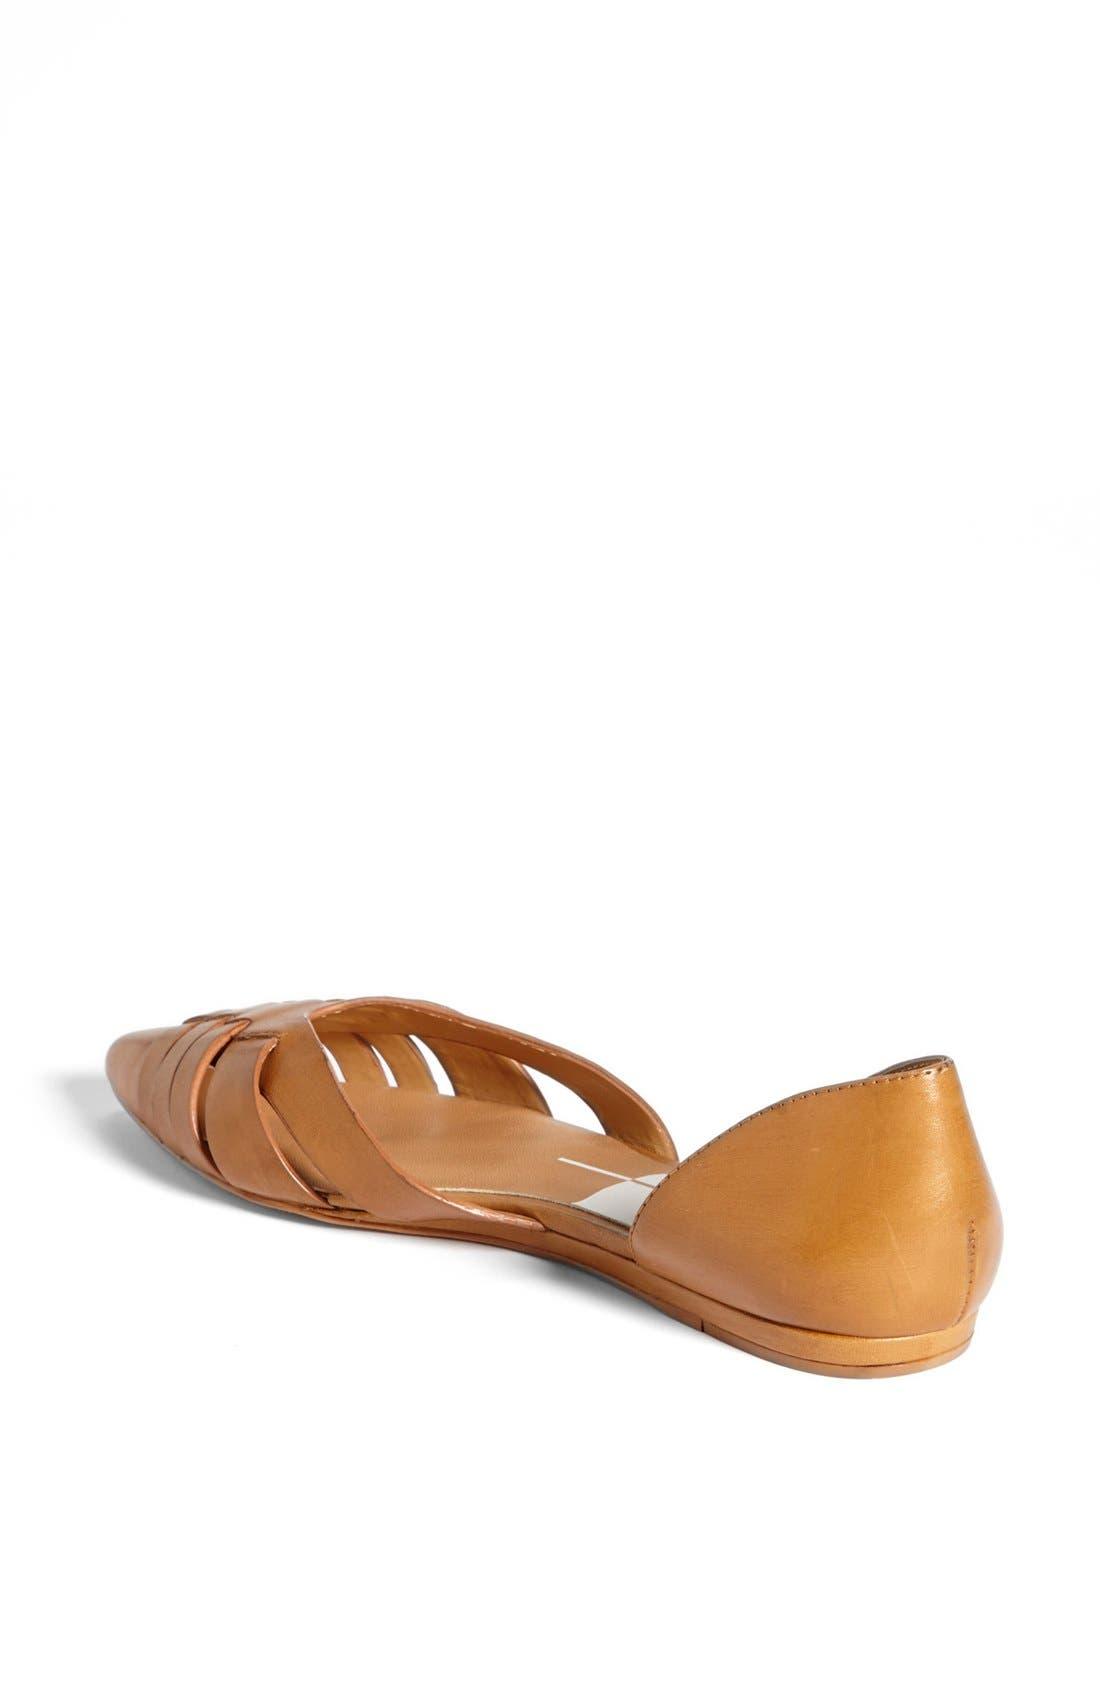 Alternate Image 2  - Dolce Vita 'Alpha' Leather Flat Sandal